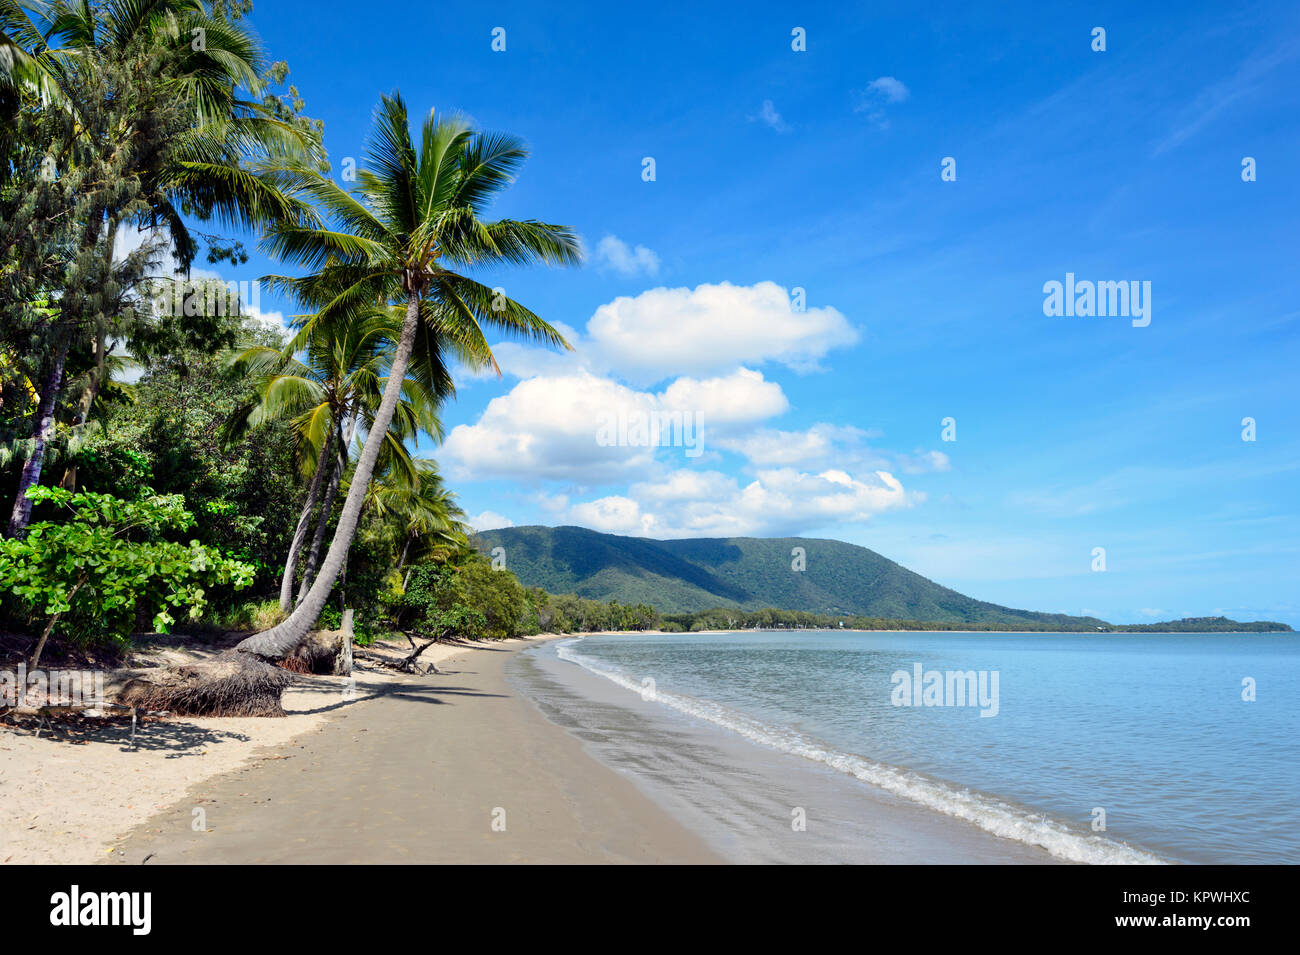 view-of-scenic-kewarra-beach-a-popular-n